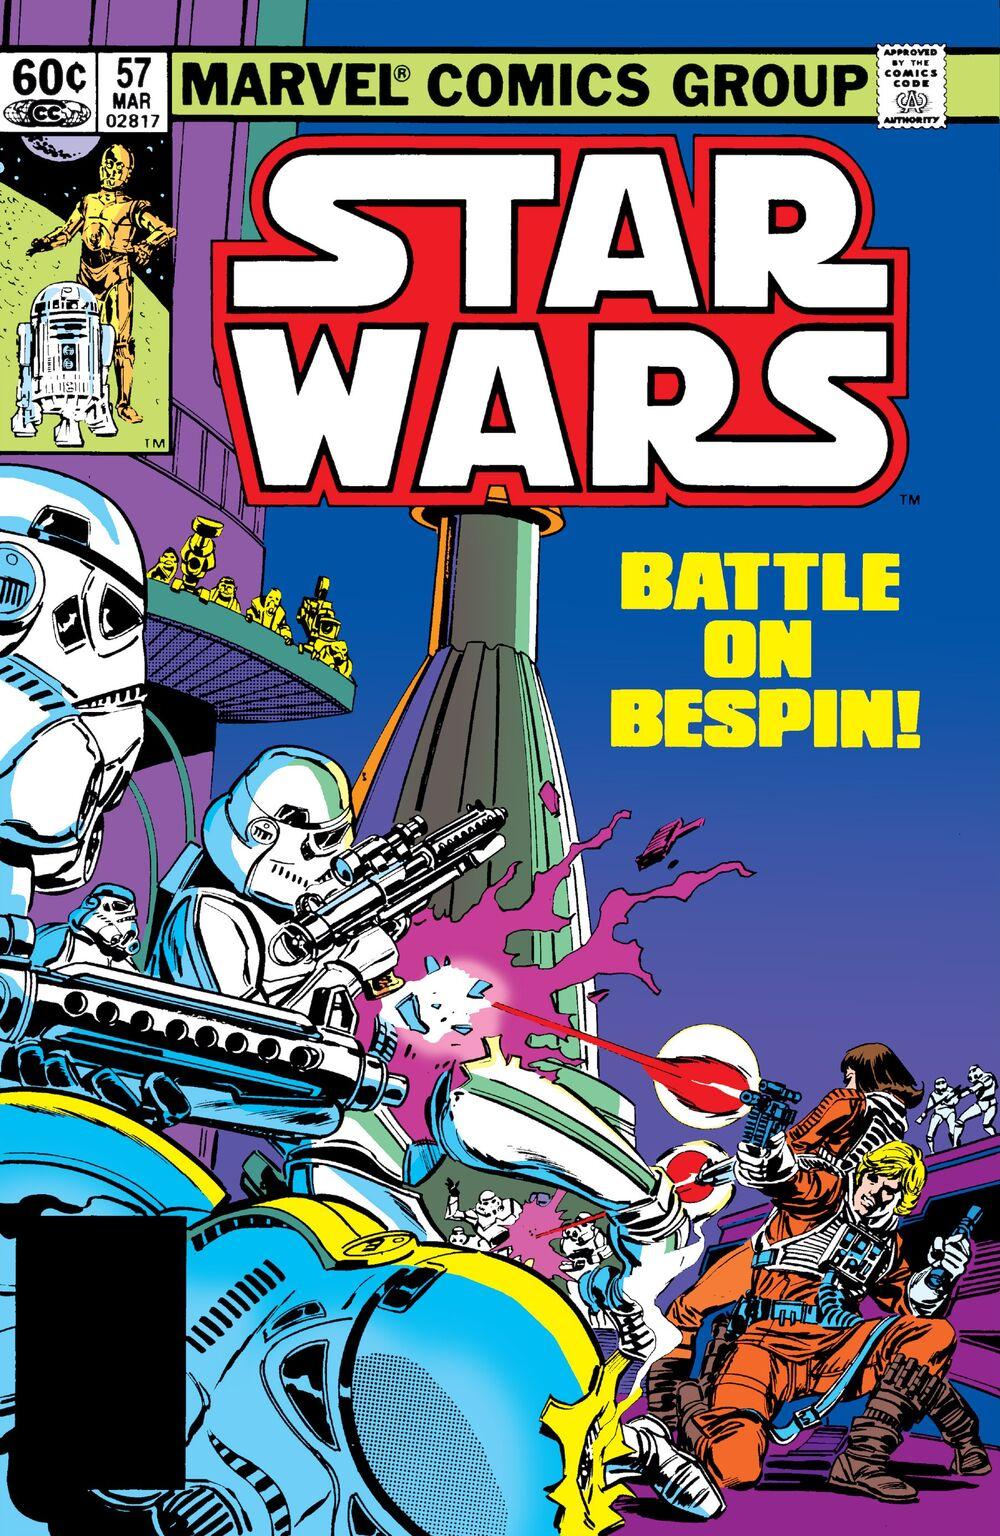 Star Wars: Hello Bespin, Goodbye!